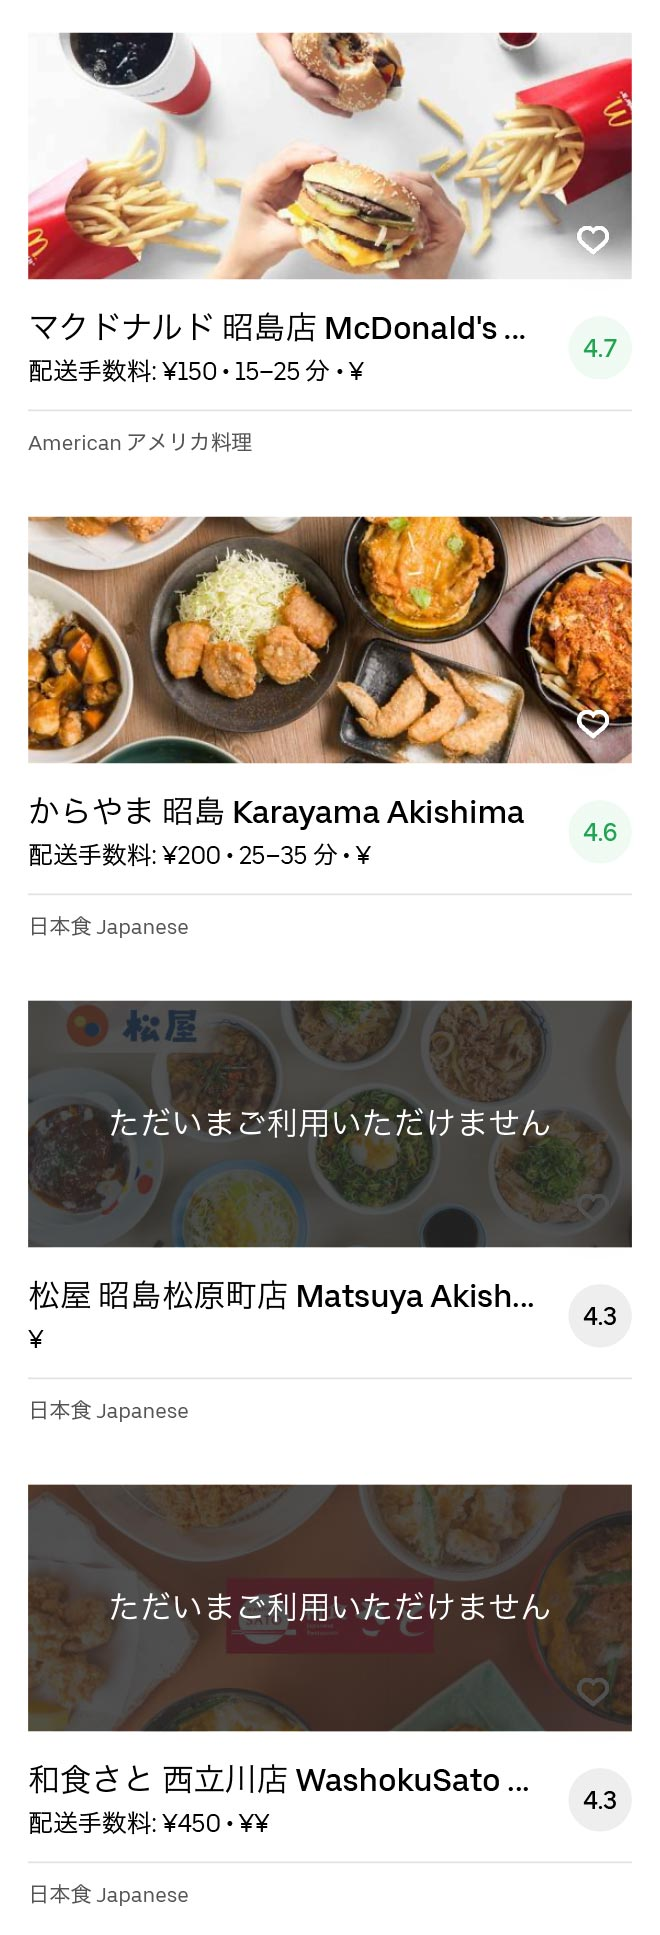 Akishima menu 2004 06